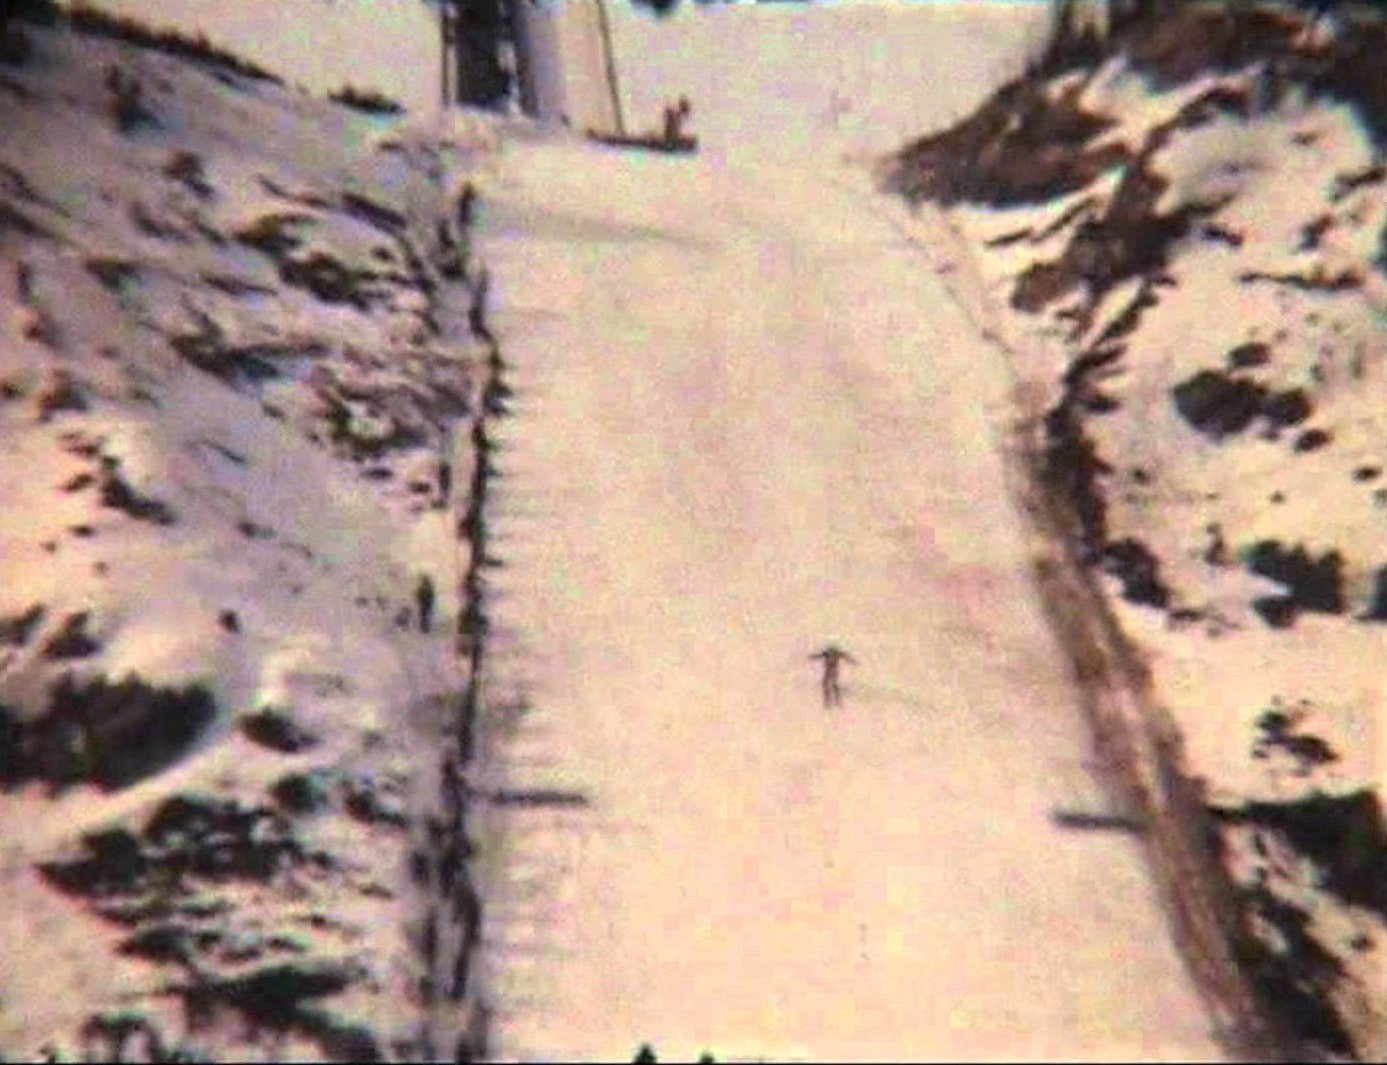 1972 Copper Peak ski flying event